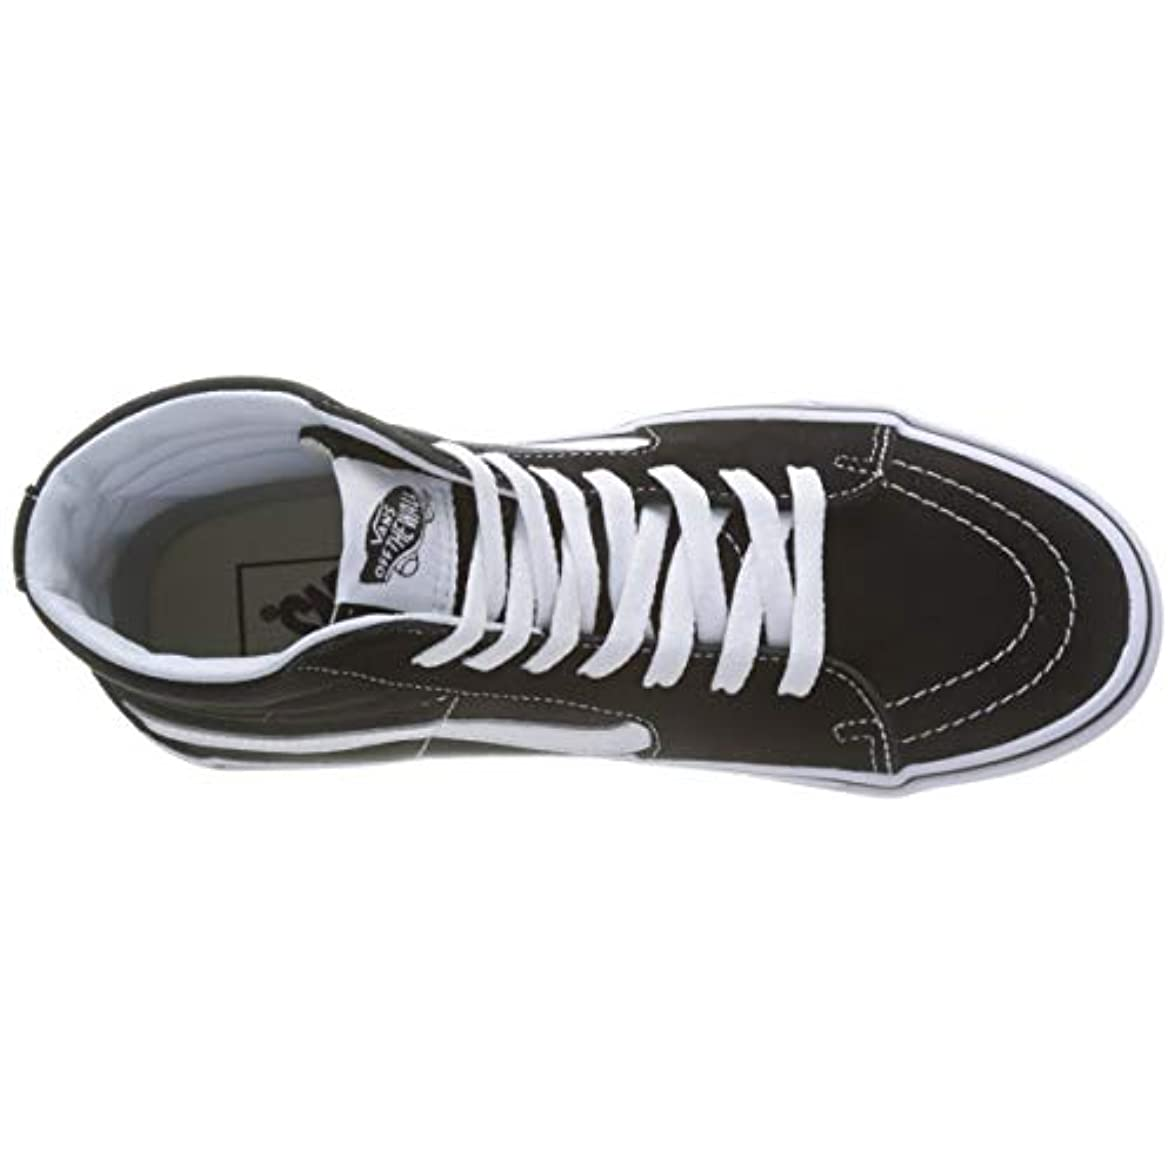 Vans Sk8-hi Reissue Leather Sneaker Unisex – Adulto